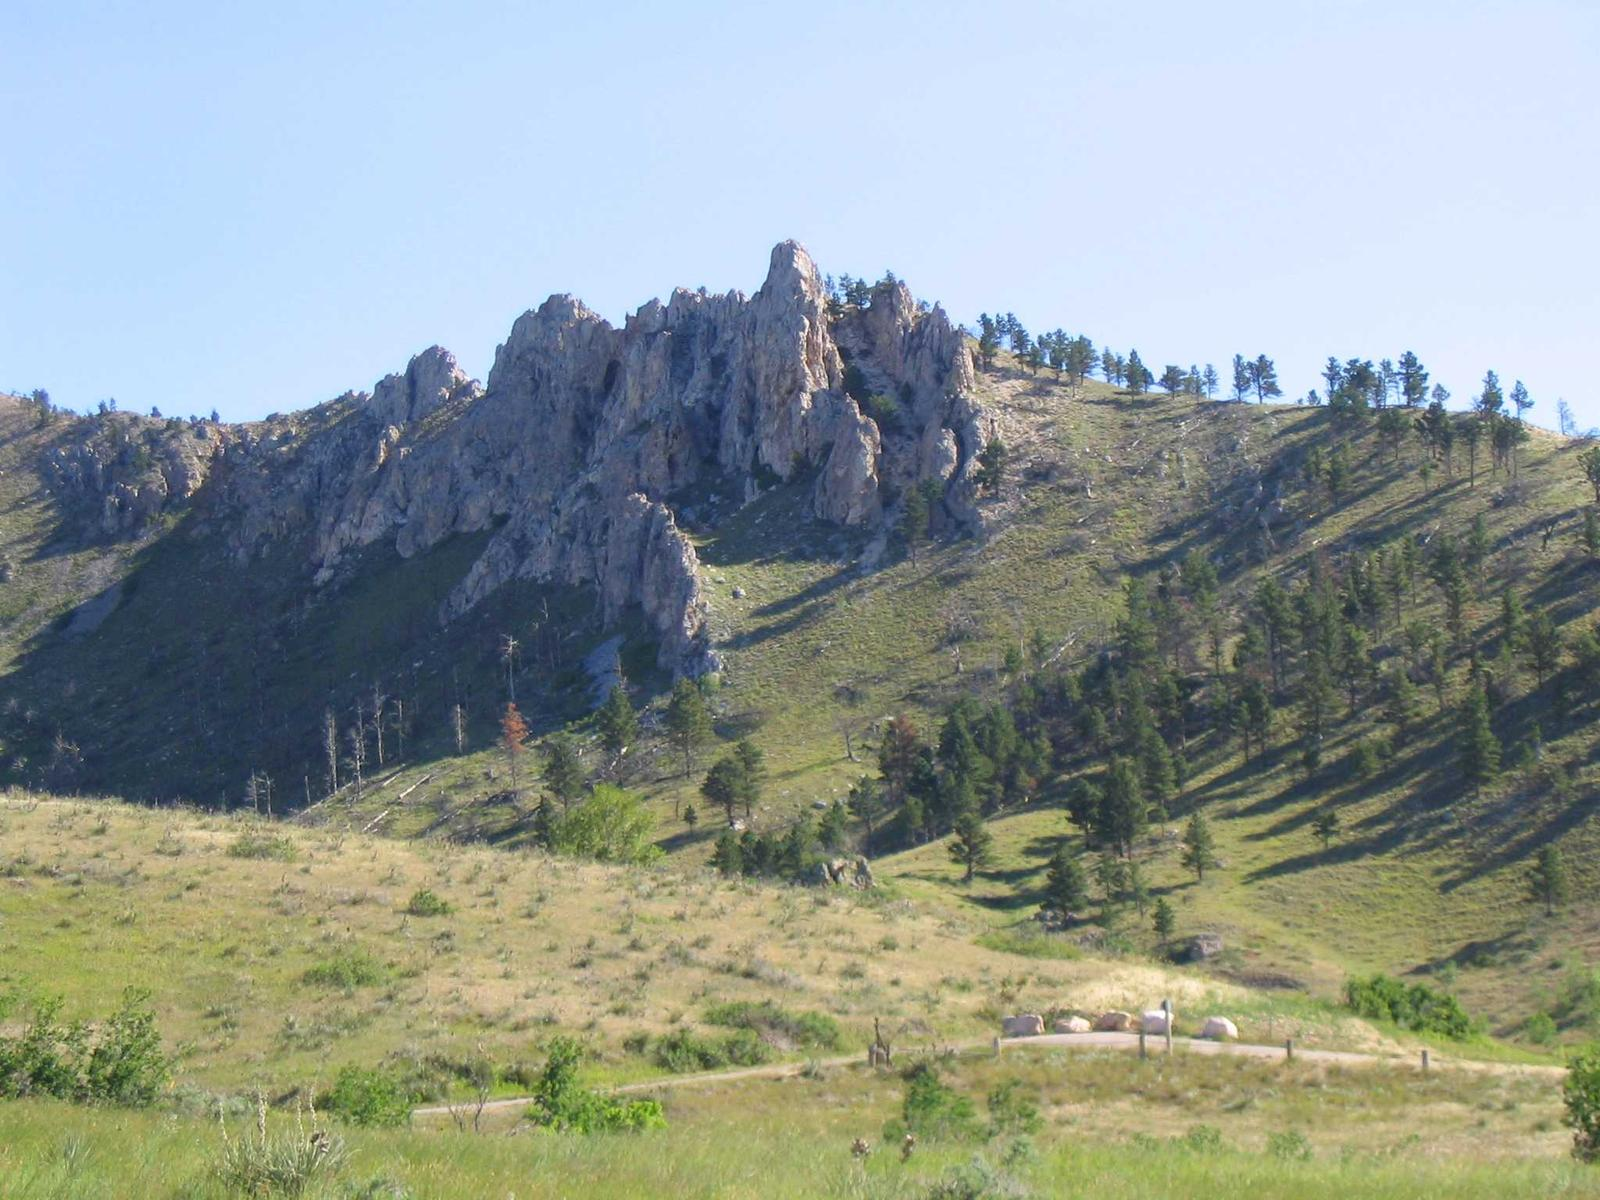 Black Hills South Dakota Image 1600x1200